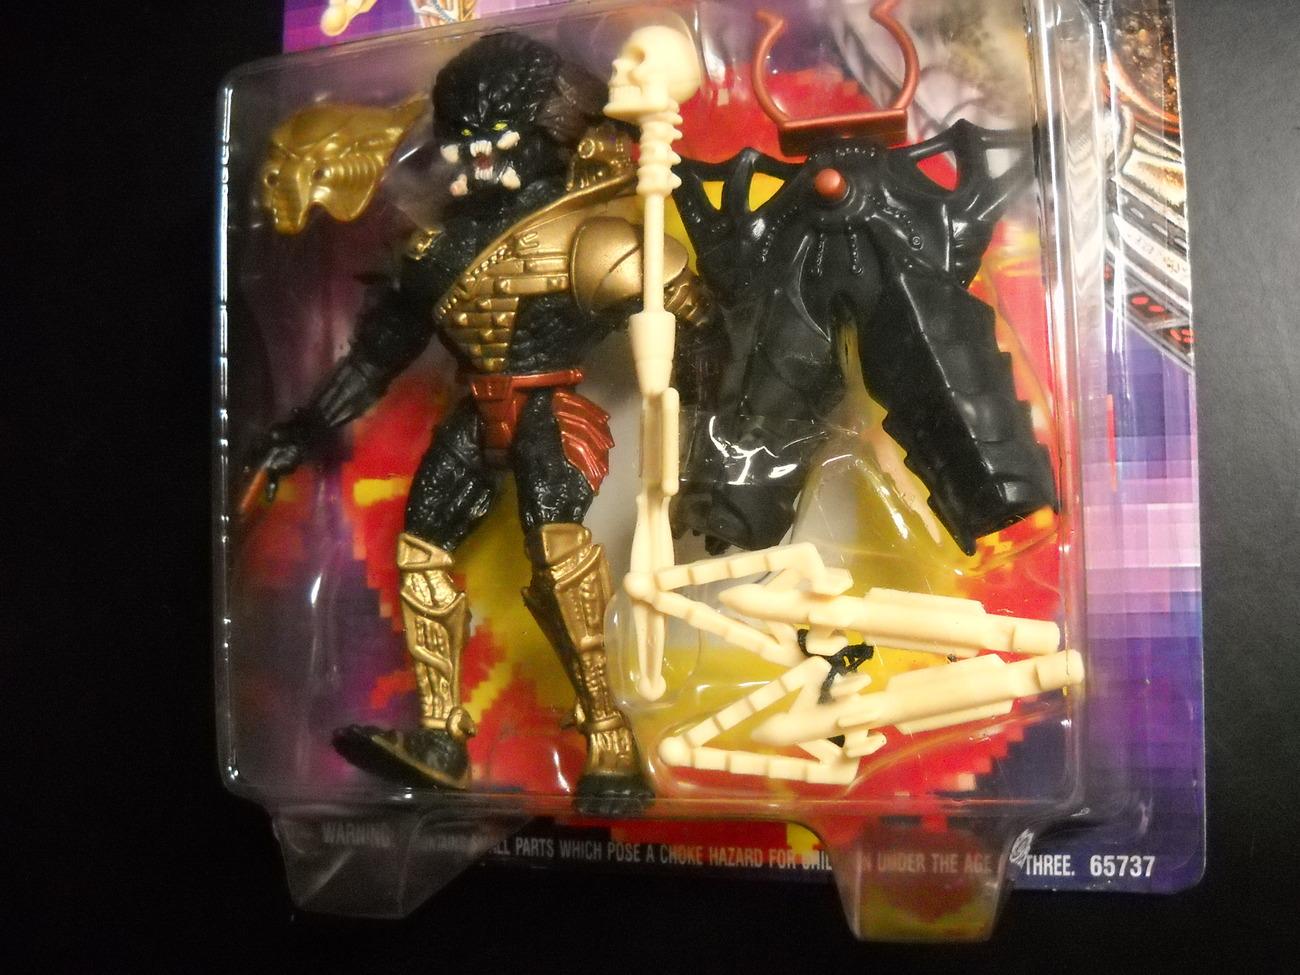 Kenner Predator 1994 Nightstorm Predator with Turbo Blast Factory Sealed On Card